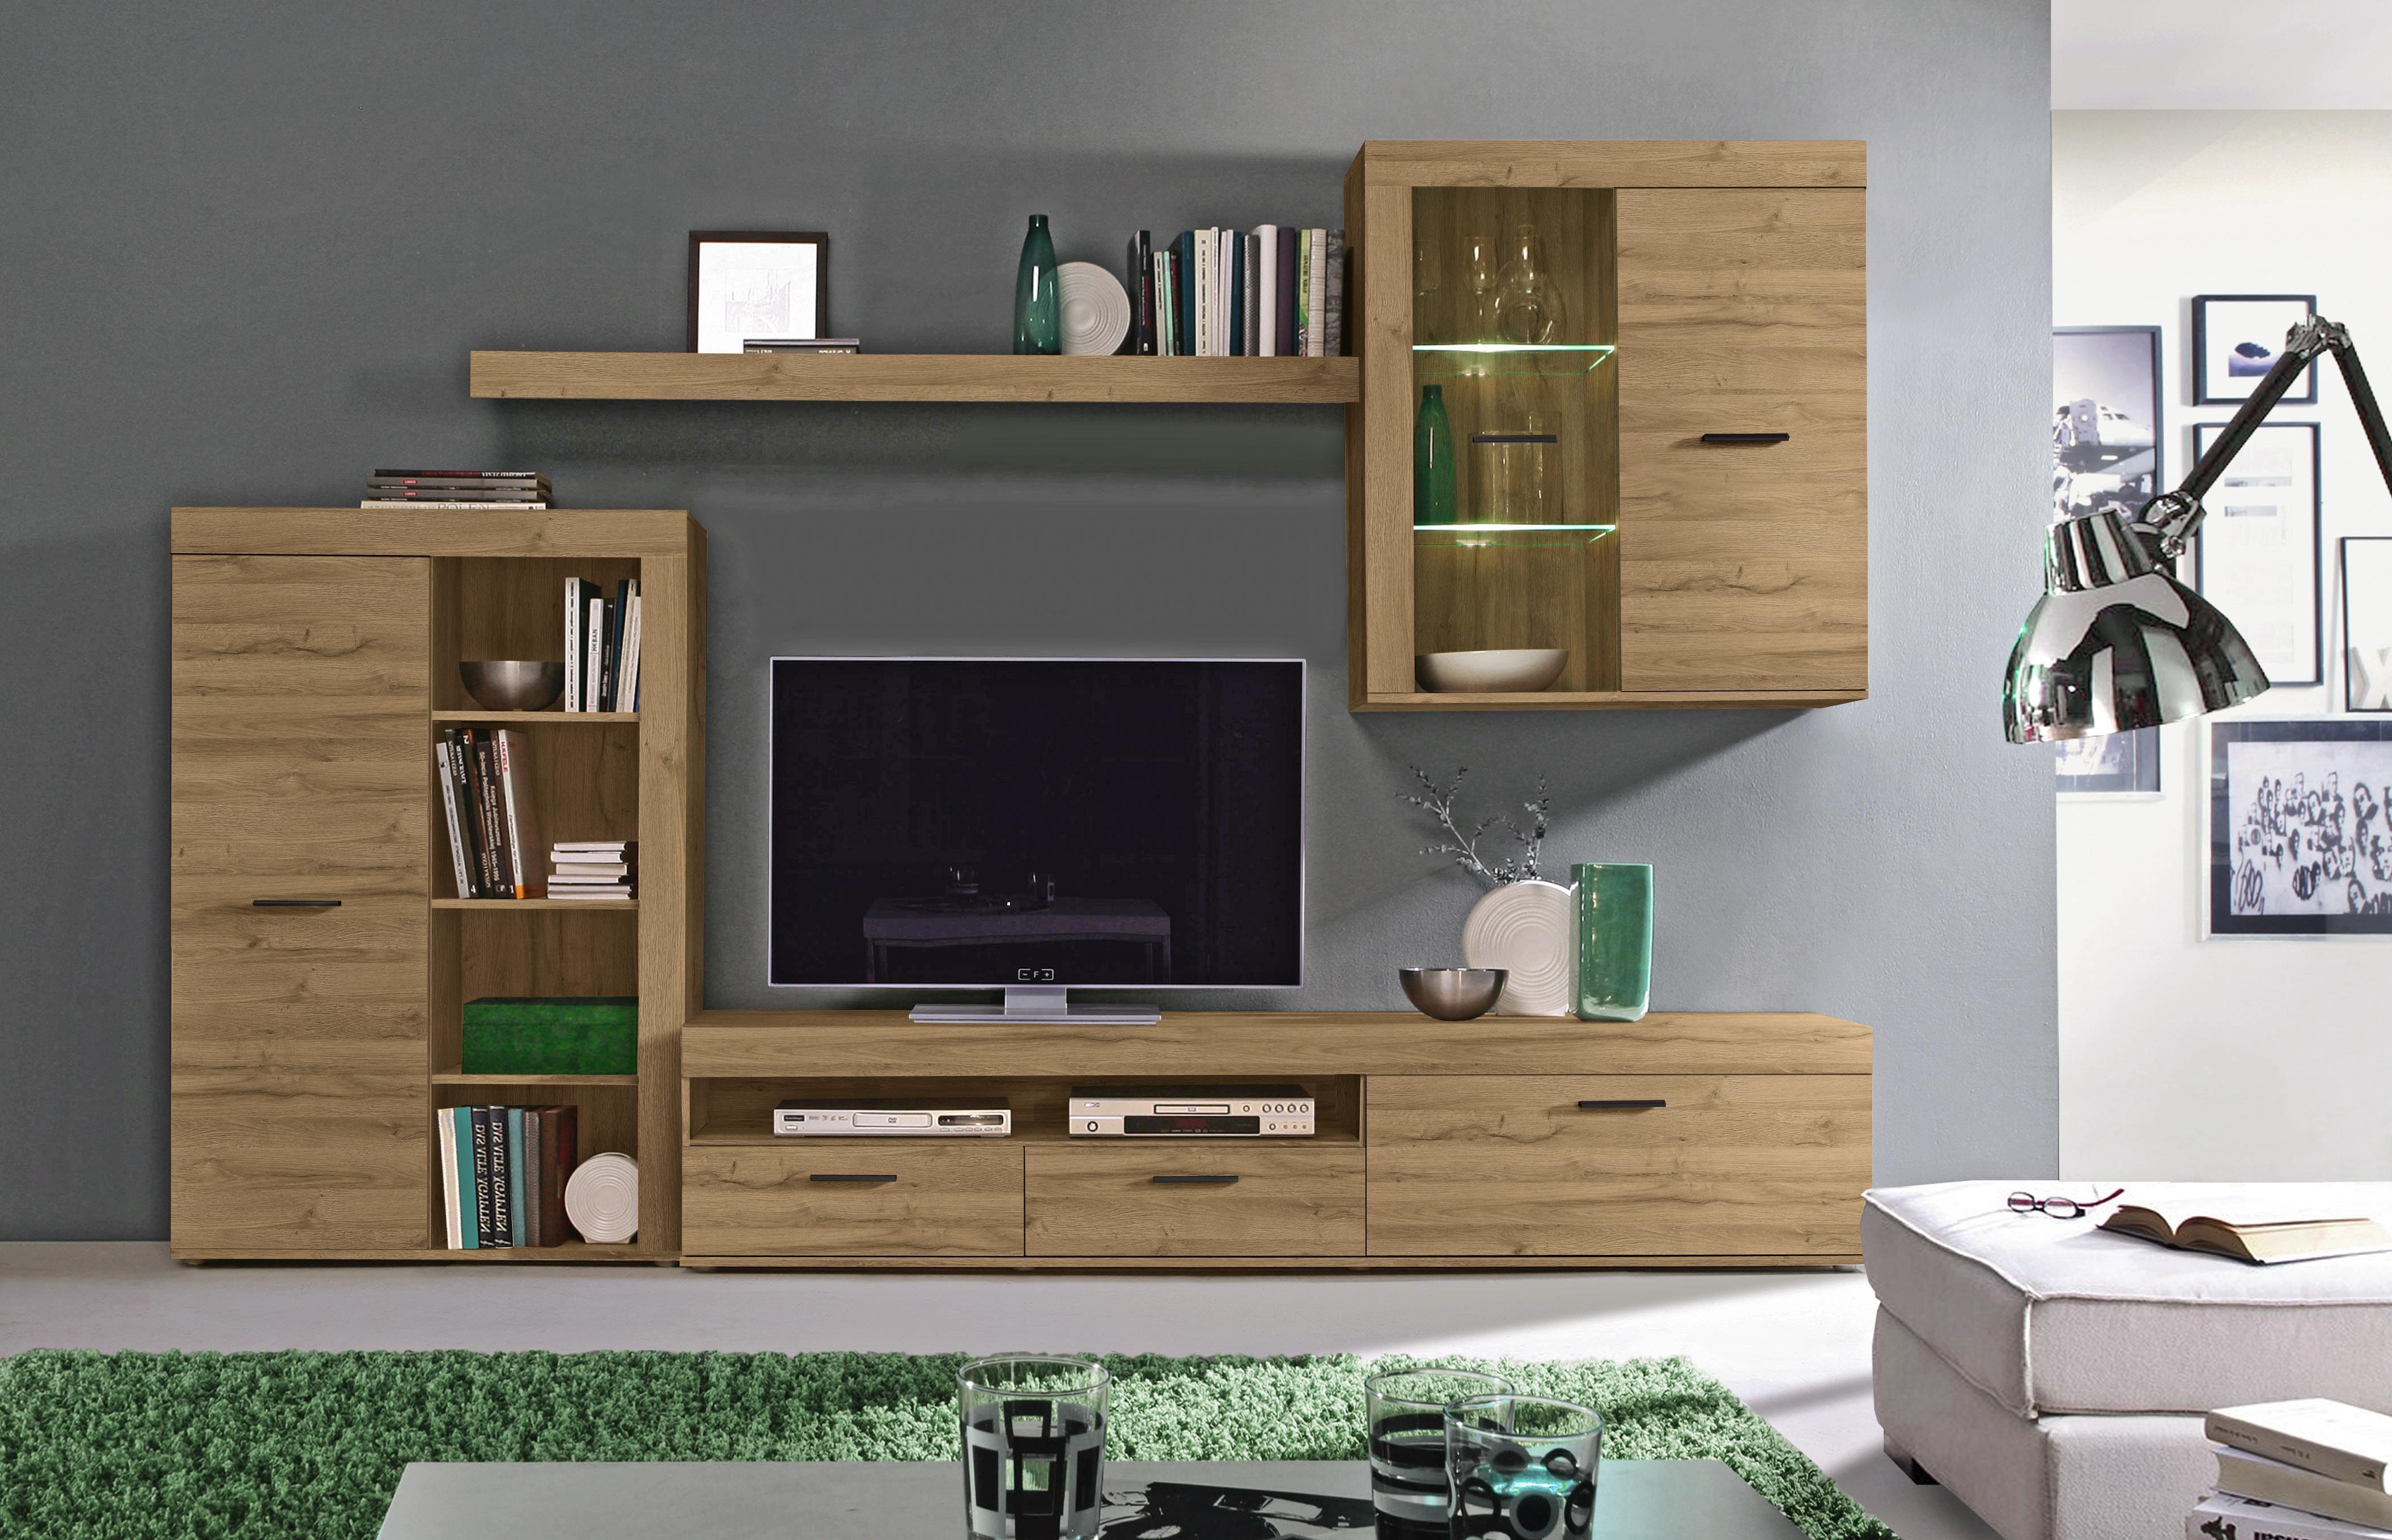 wohnwand eichefarben grau jeanne and jerome. Black Bedroom Furniture Sets. Home Design Ideas